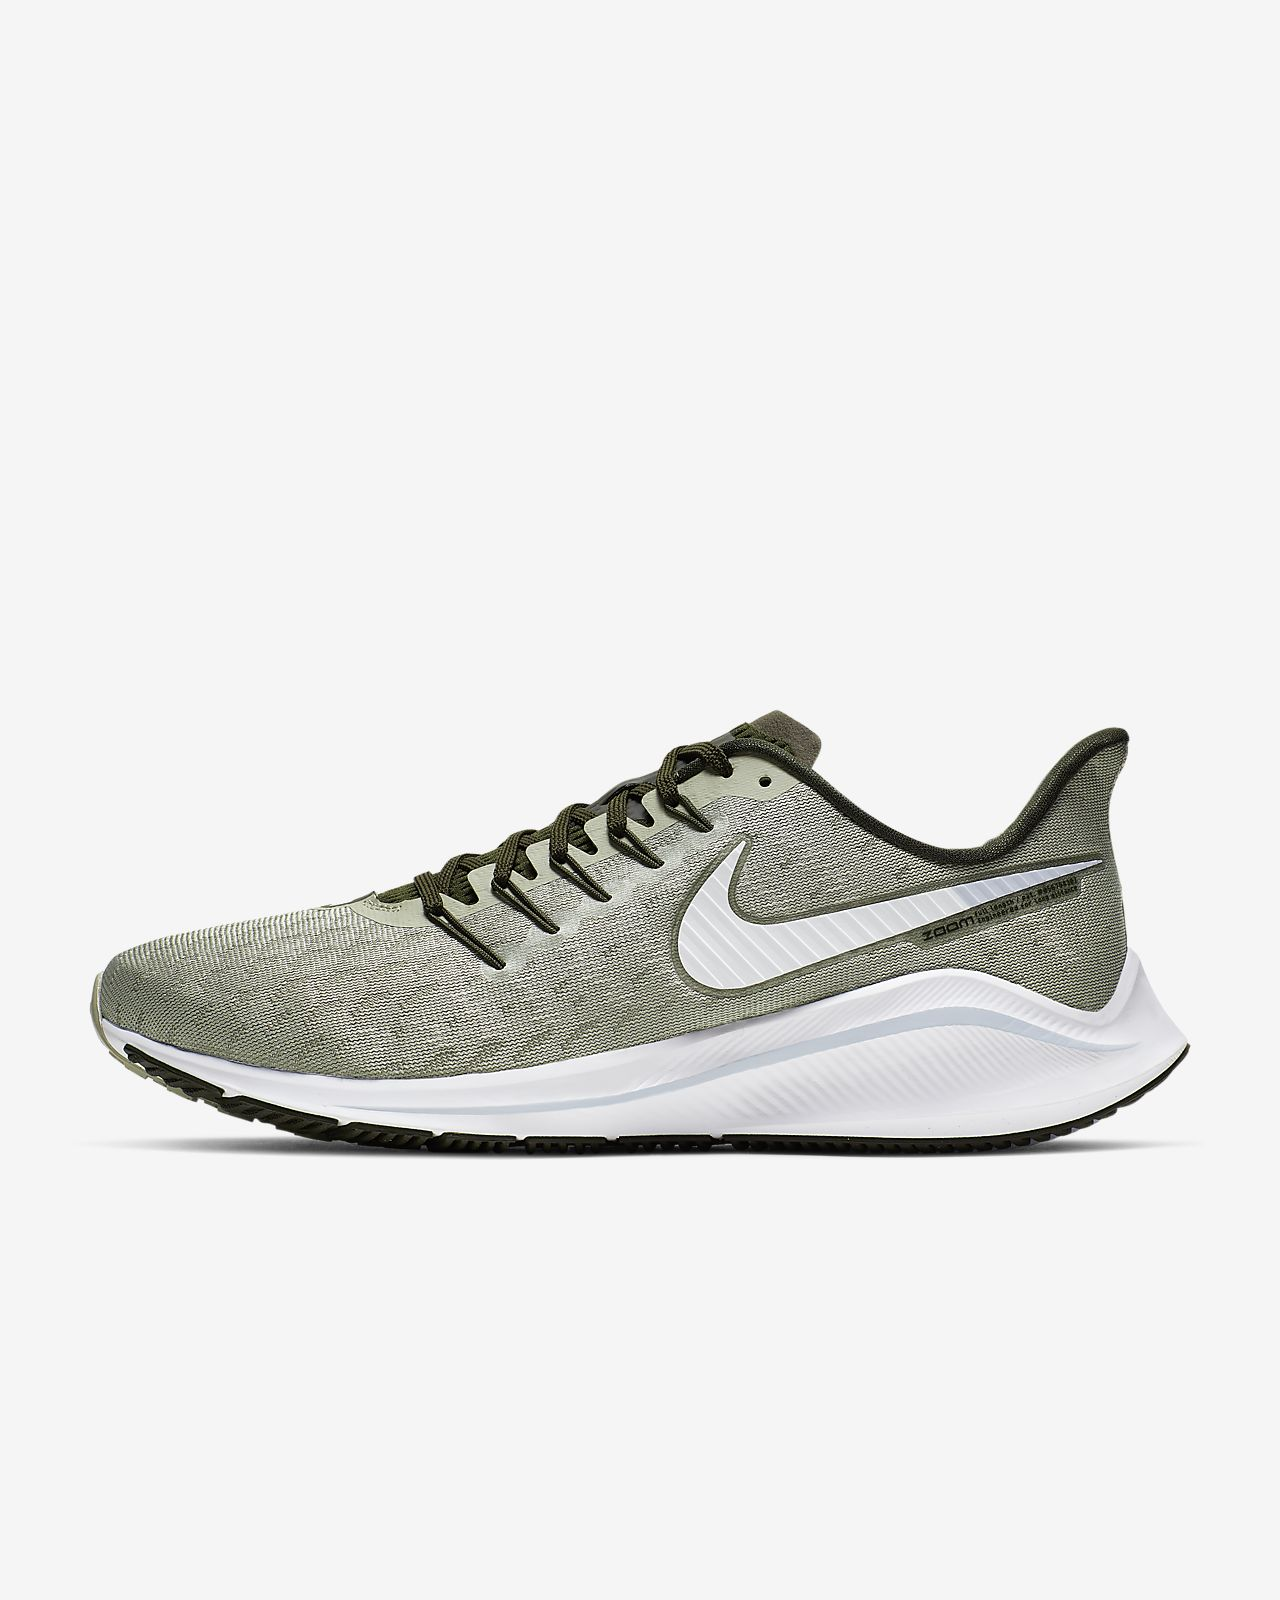 Nike Air Zoom Vomero 14 男子跑步鞋